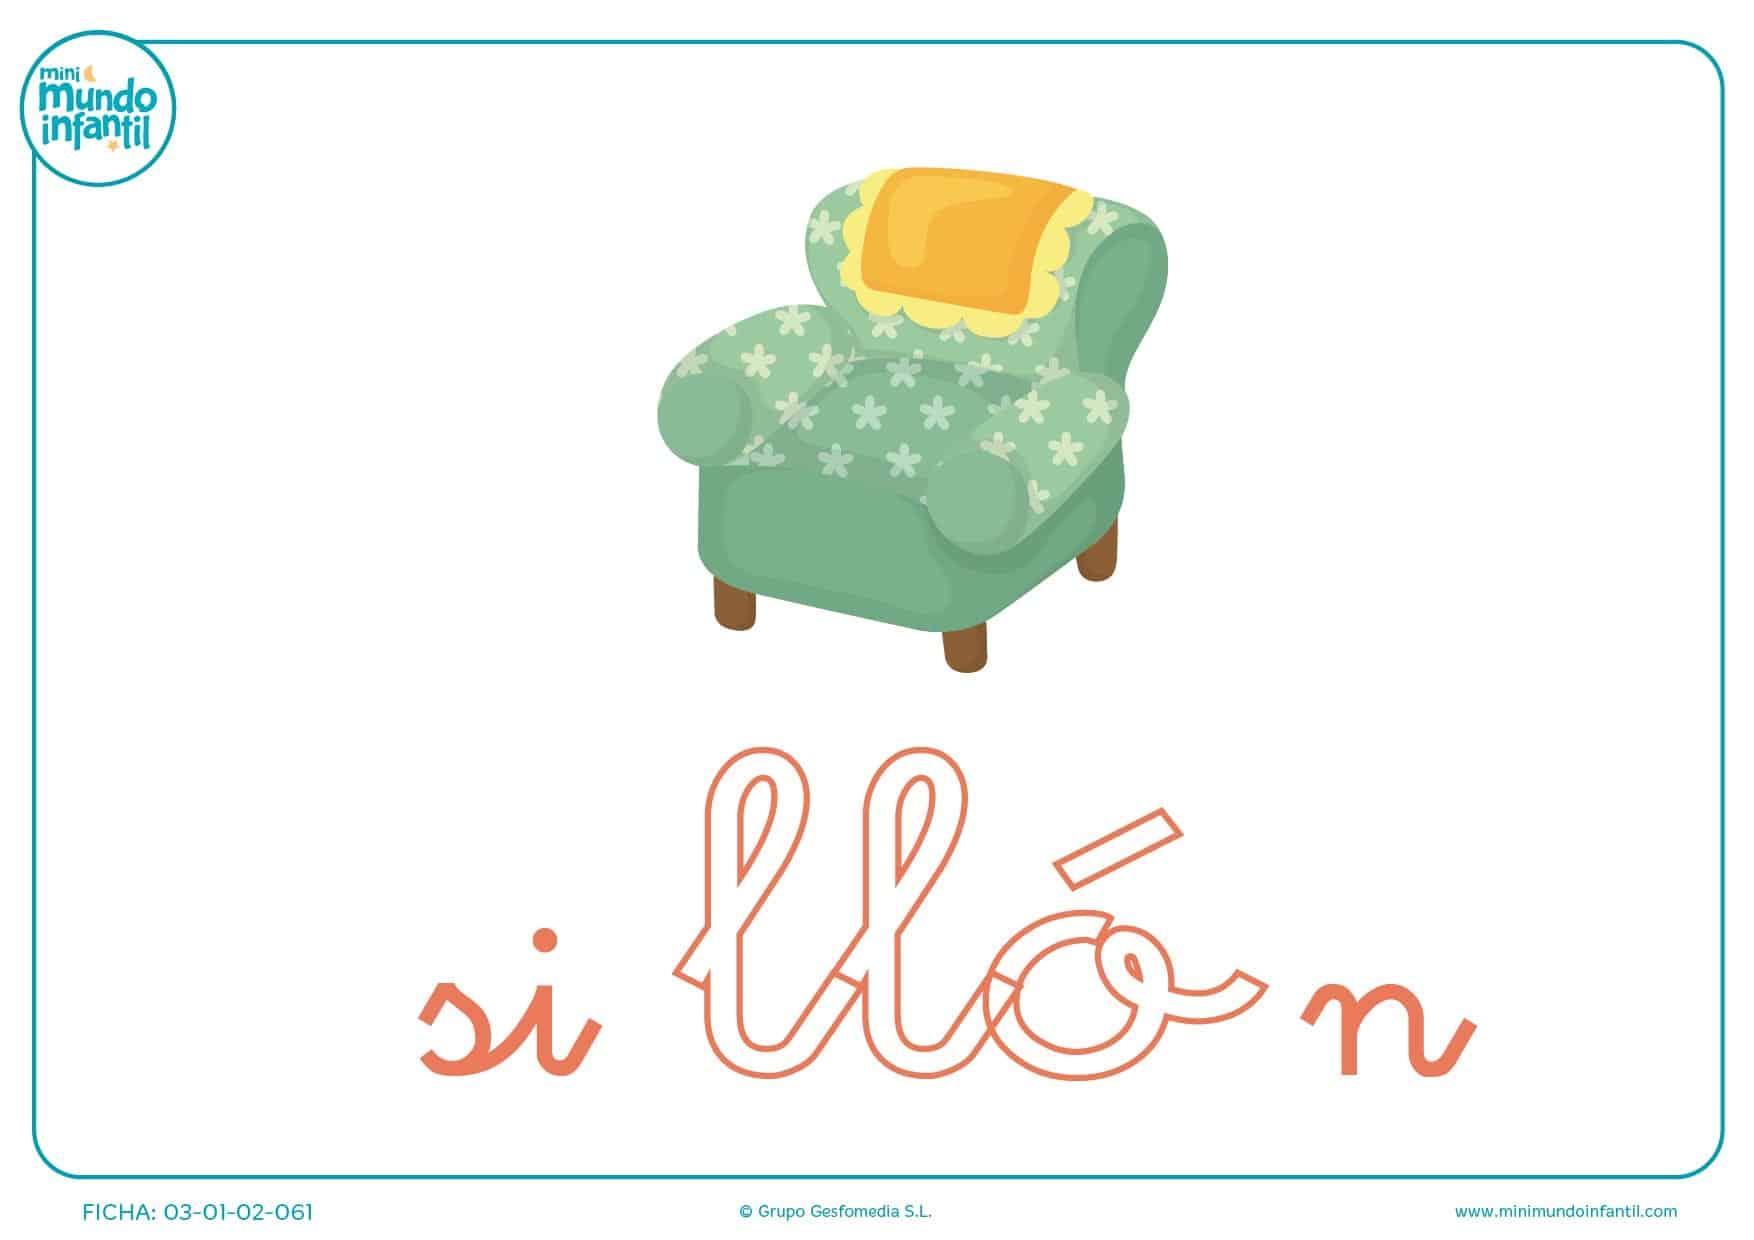 Completa la sílaba LLO minúscula de sillón